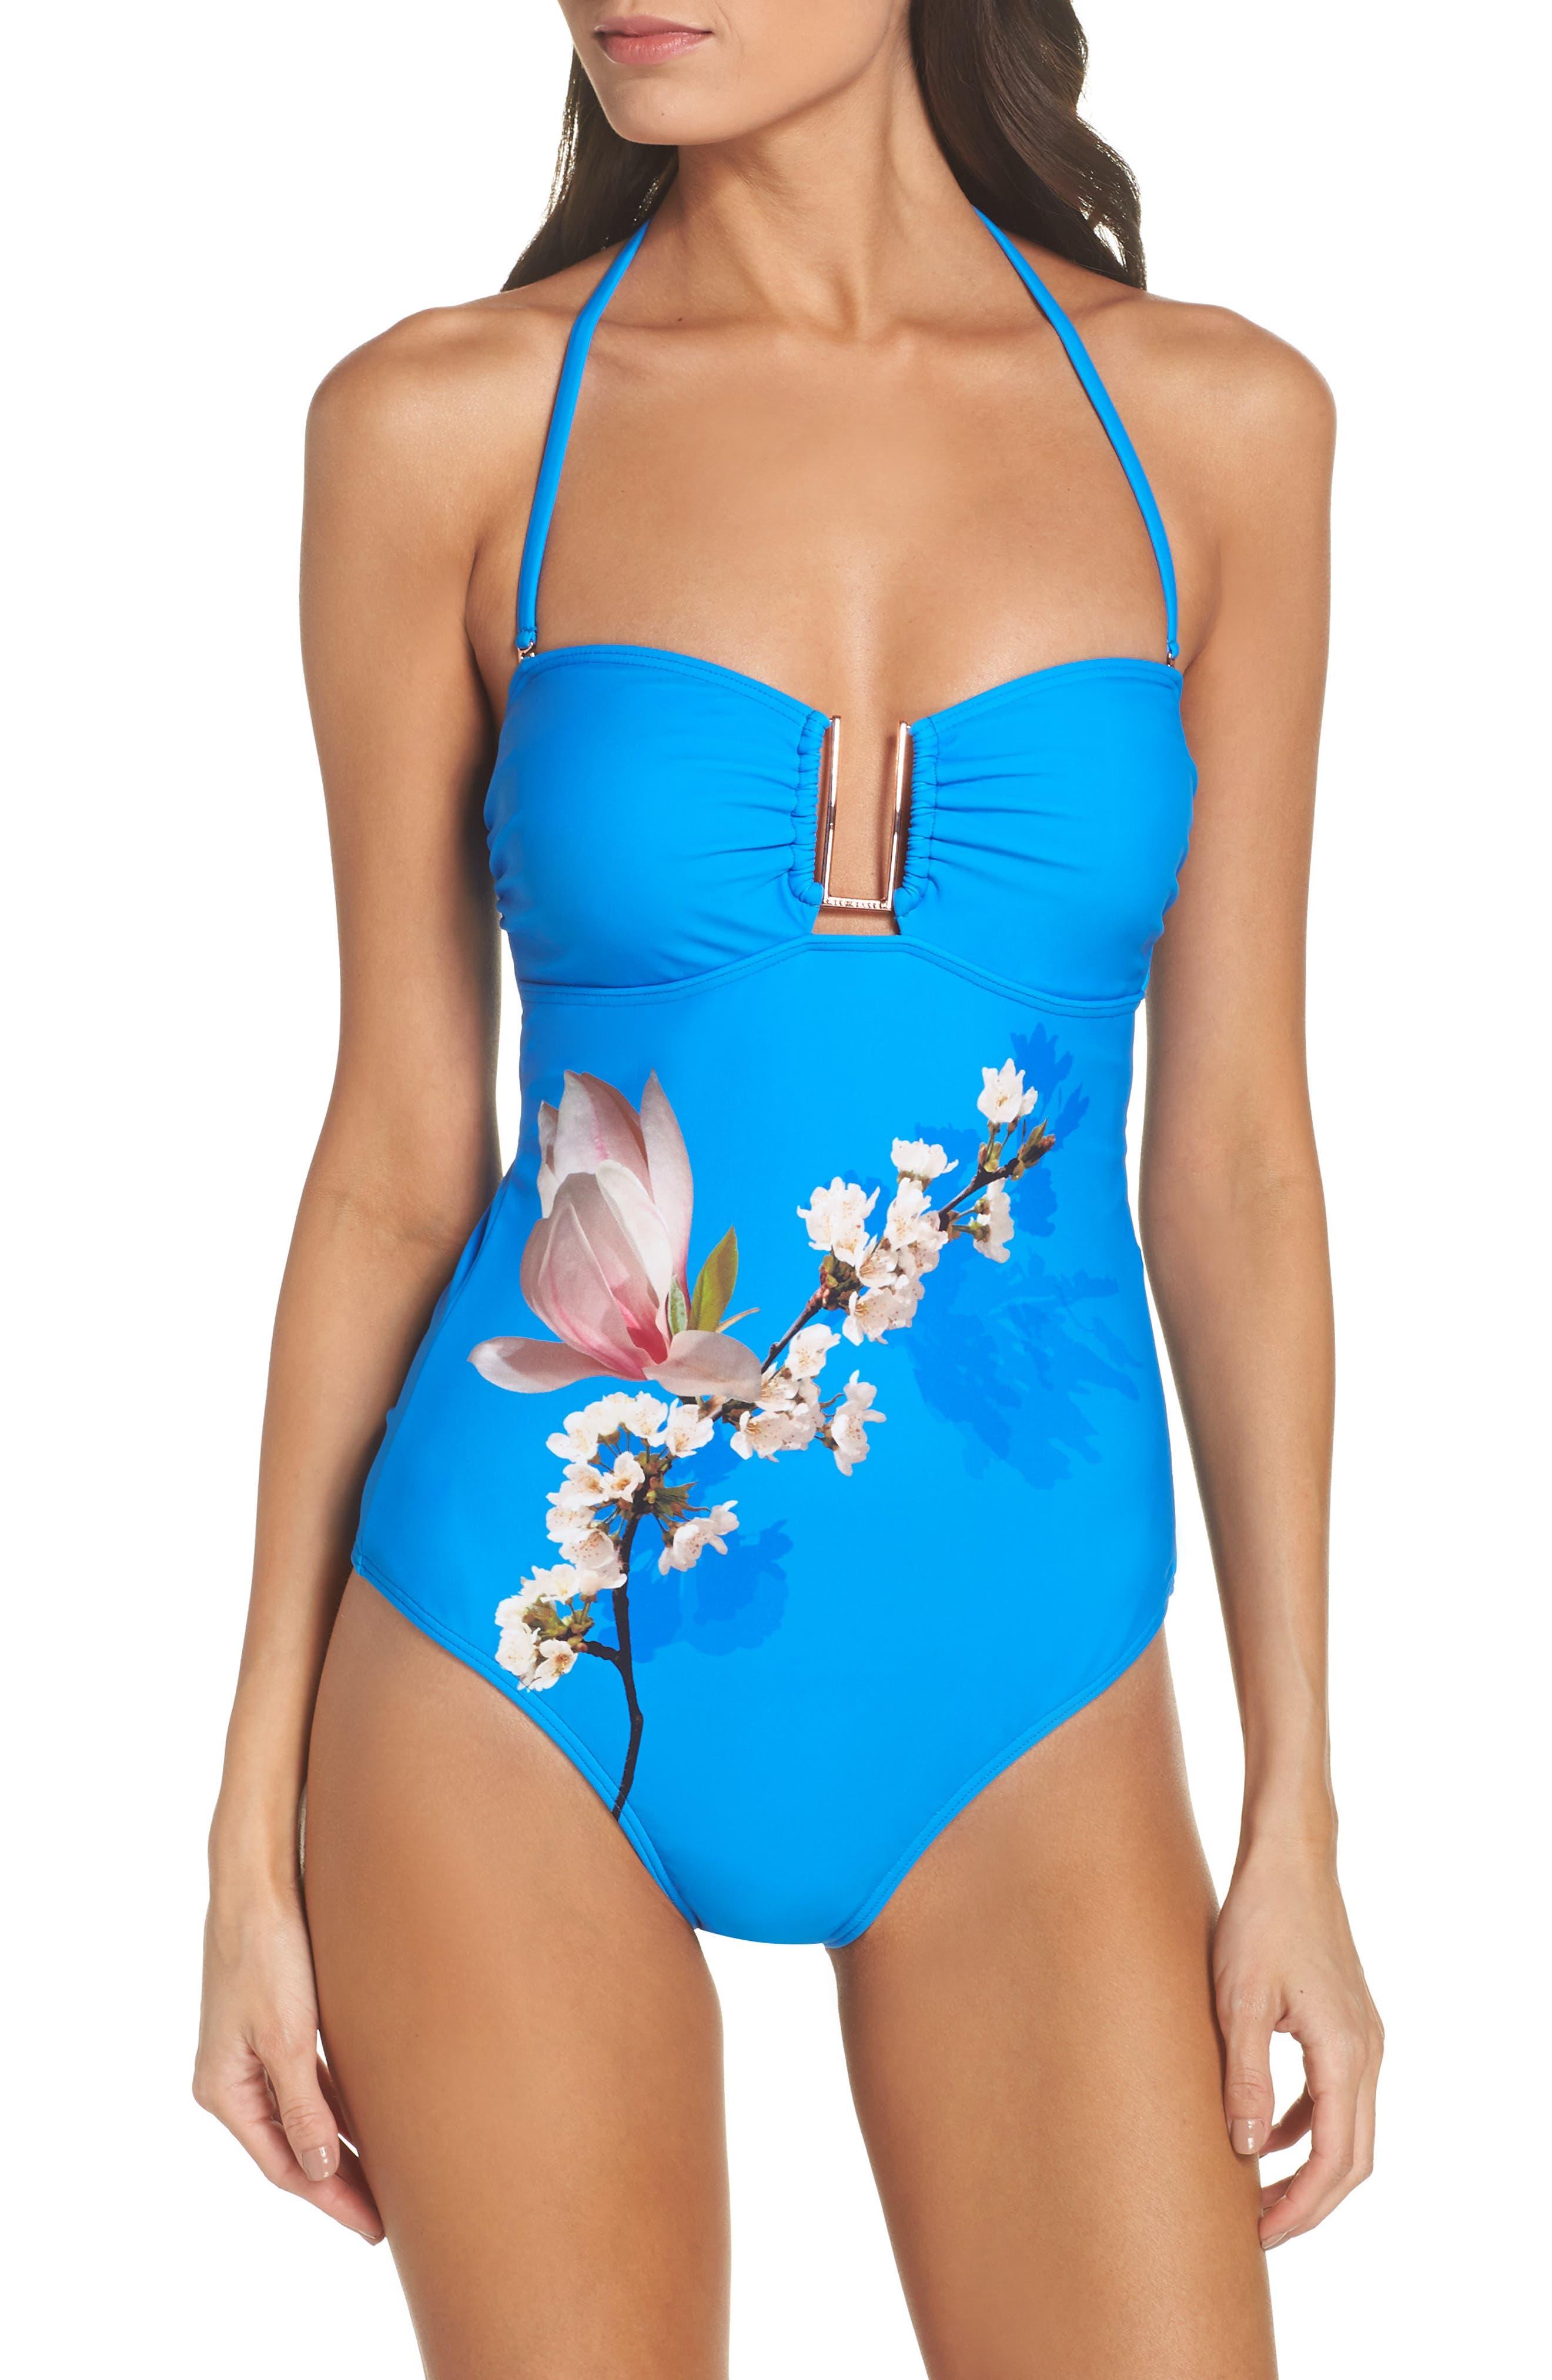 Harmony Bandeau One-Piece Swimsuit,                             Alternate thumbnail 2, color,                             430